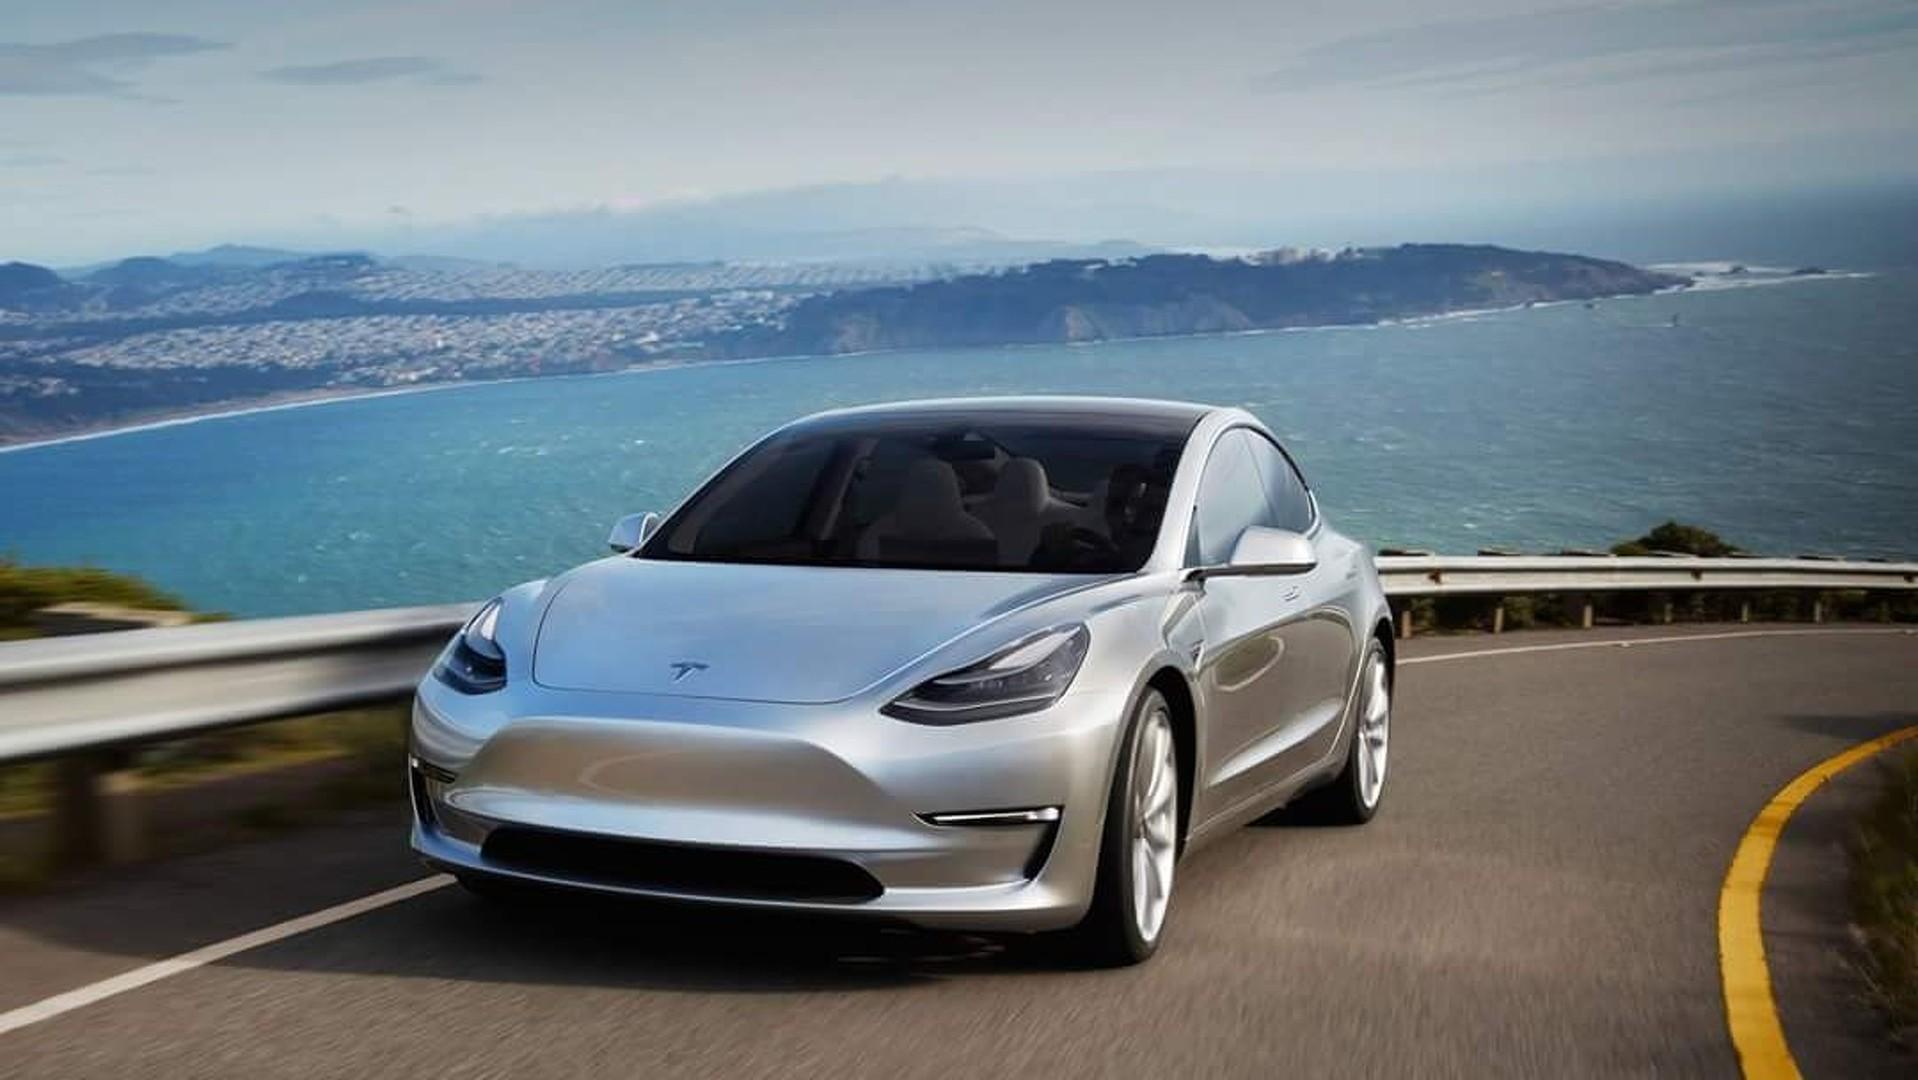 Tesla exec slams competitor EVs, calls them 'appliances'